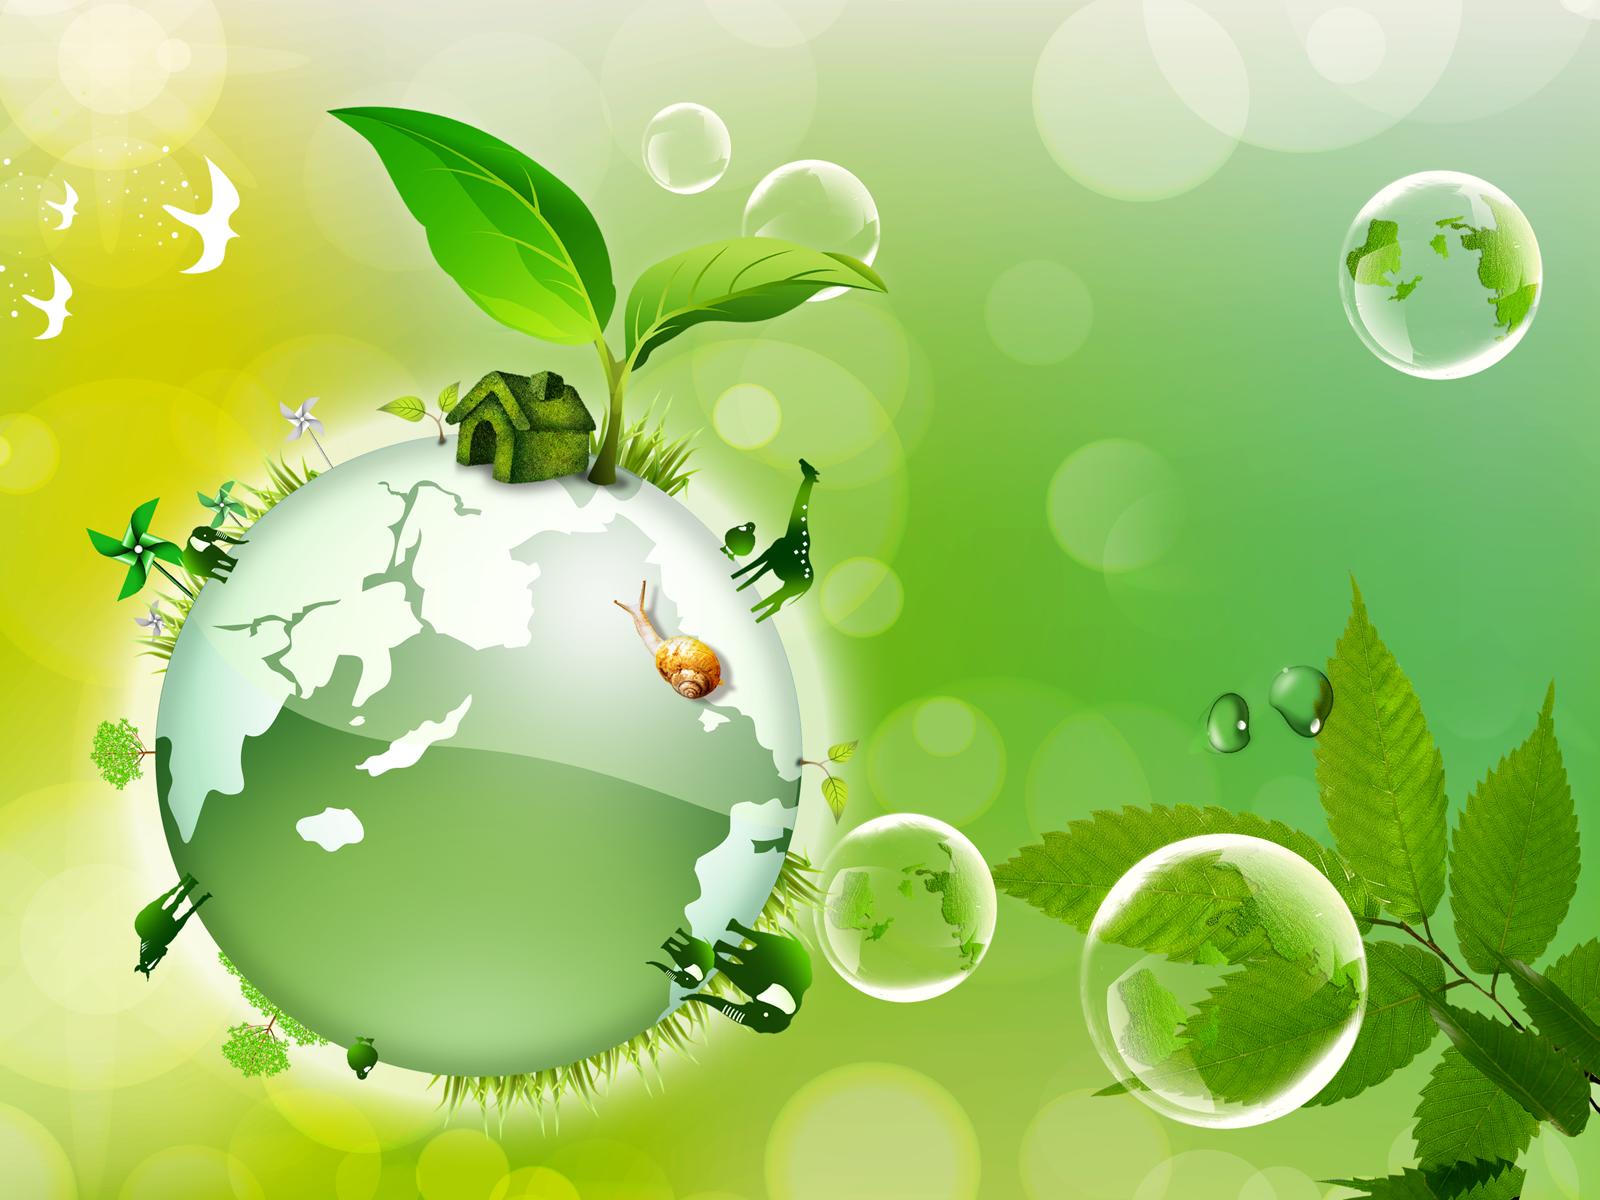 Green%2BEarth%2BEcology%2BwAl%2Btangledwing Wallpaper green technology